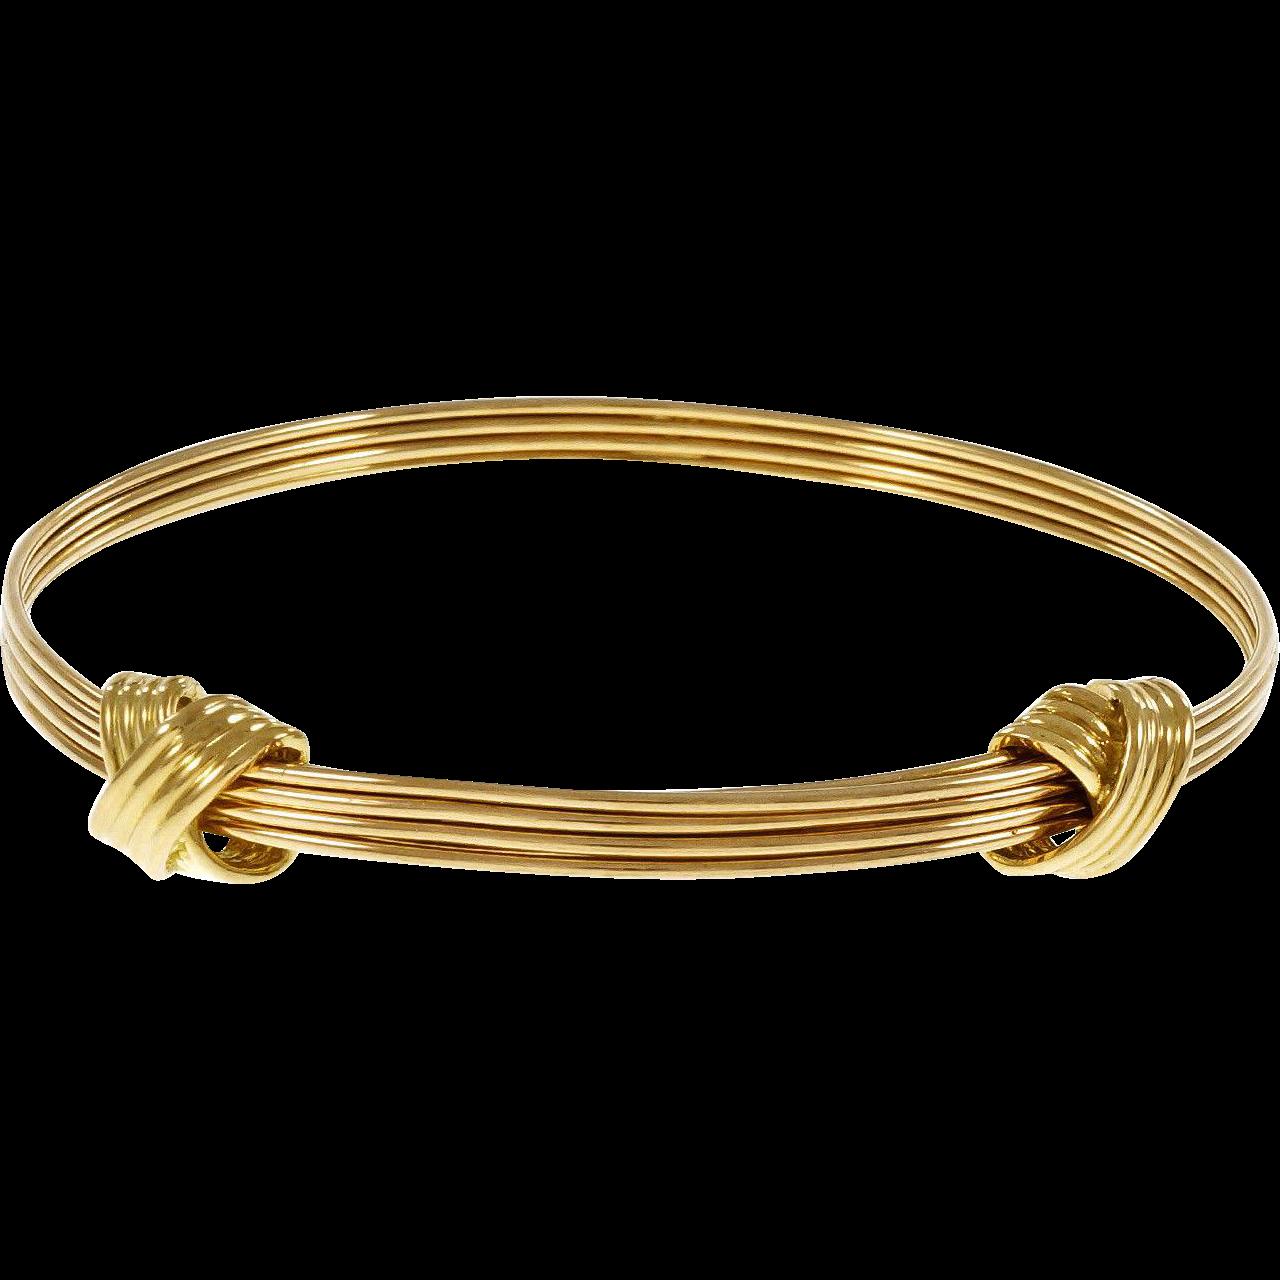 Asprey Knot Design Adjustable 18 Karat Yellow Gold Bangle Bracelet